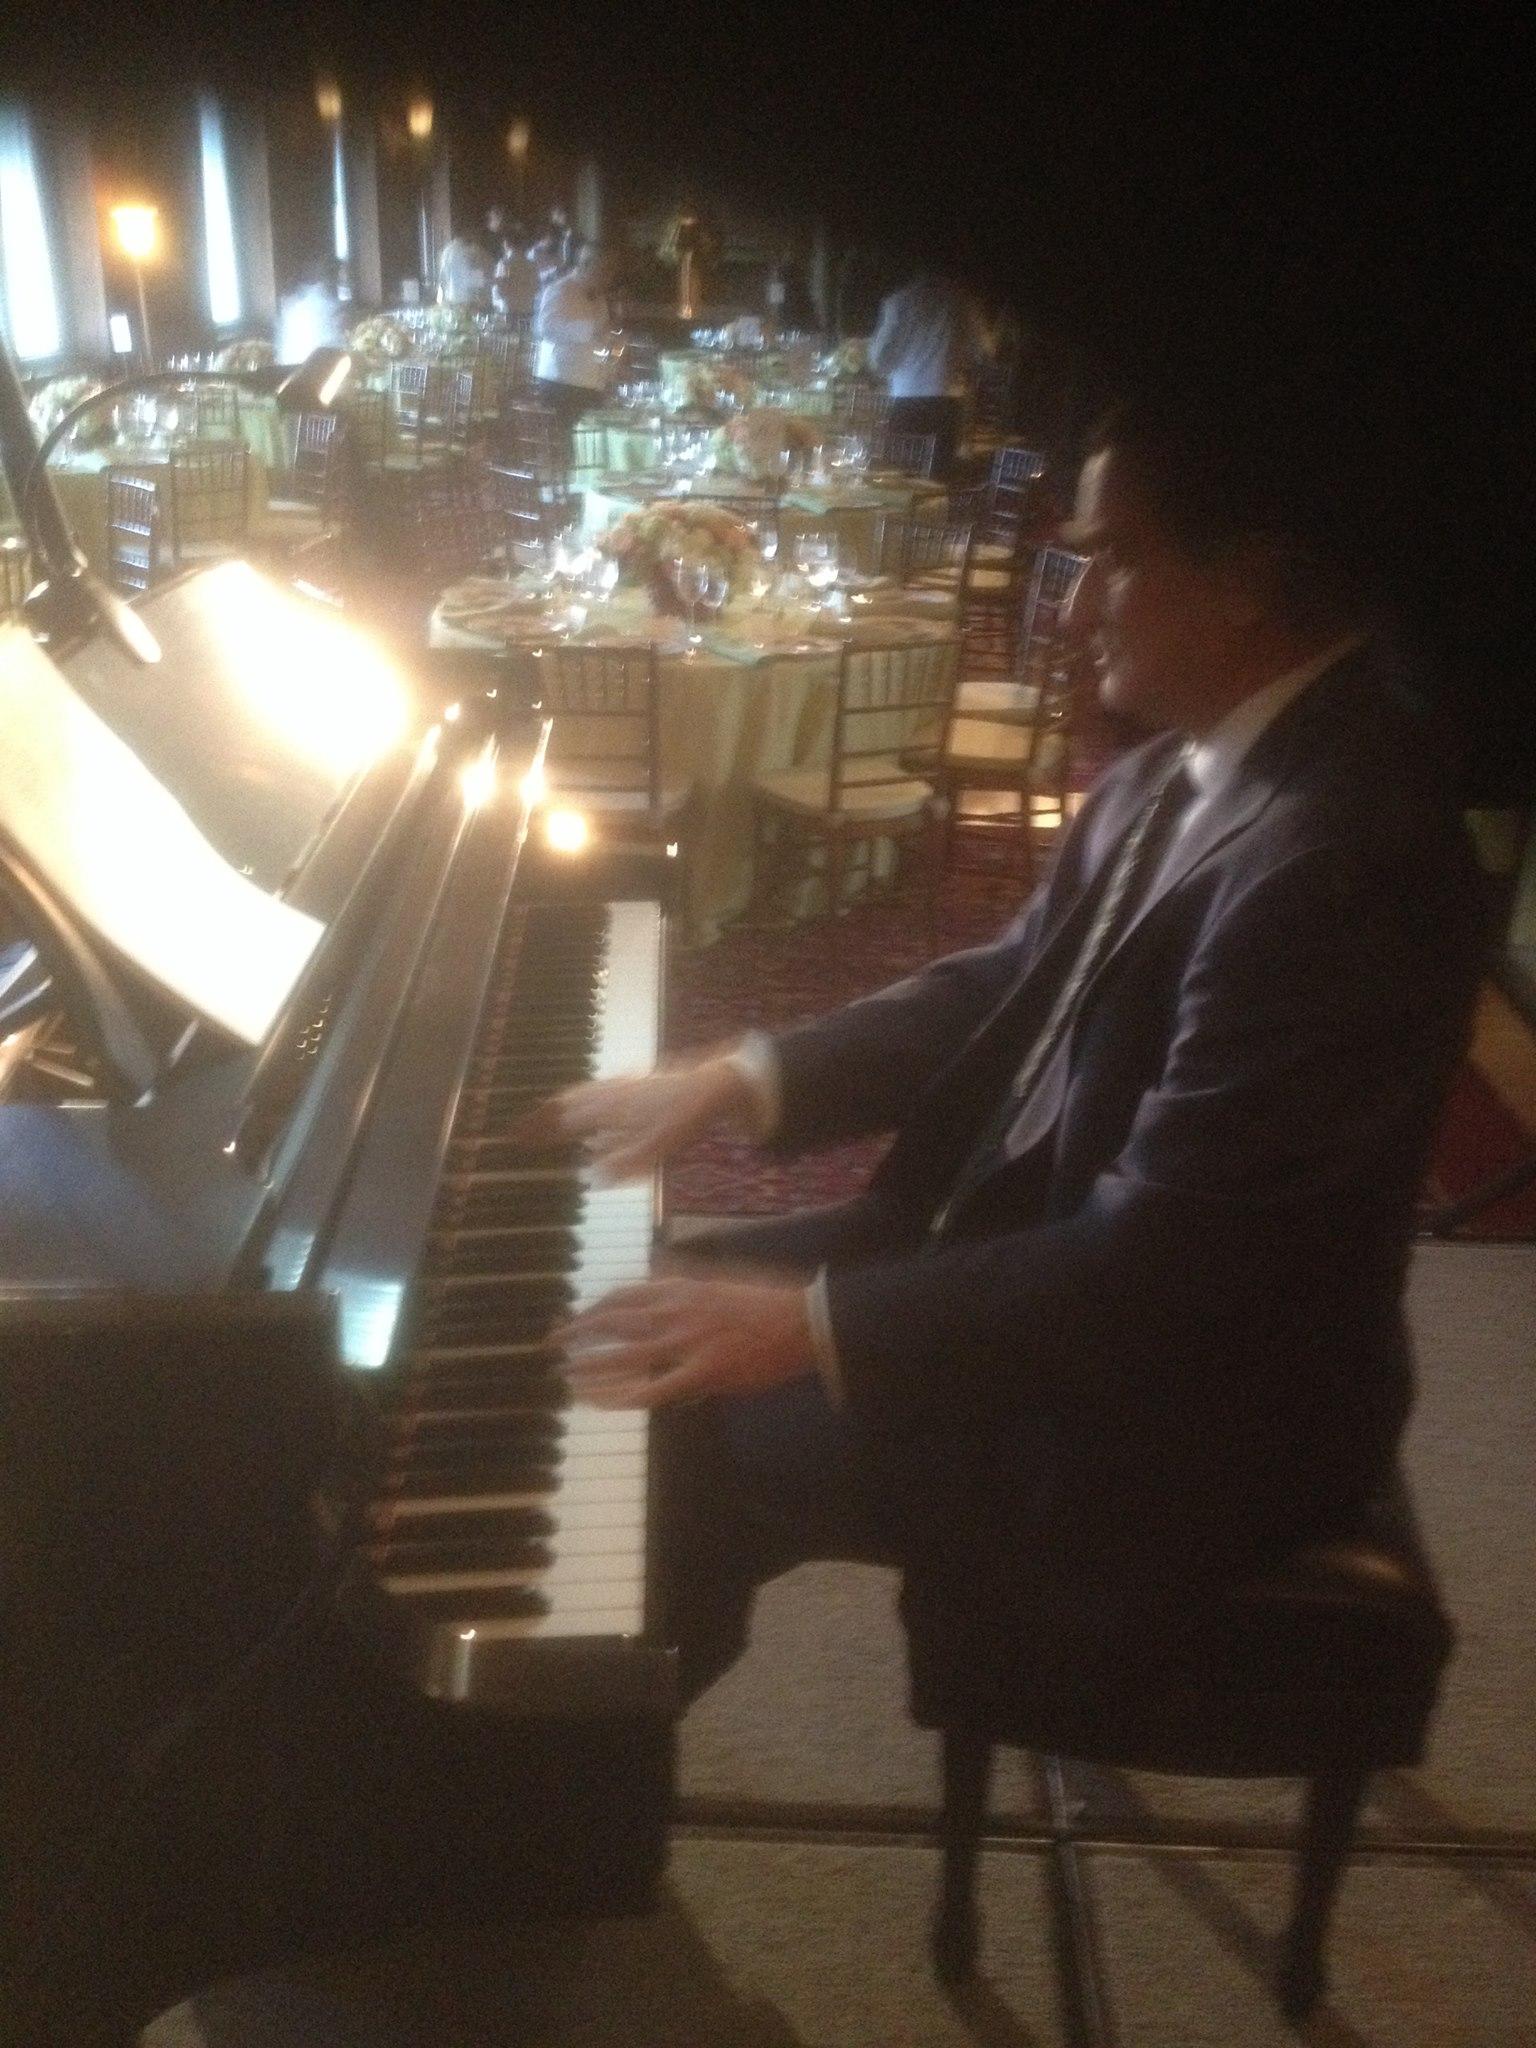 2015 1117 Bill Harris Library of Congress, Willie Nelson awarded Gershwin Prize.jpg